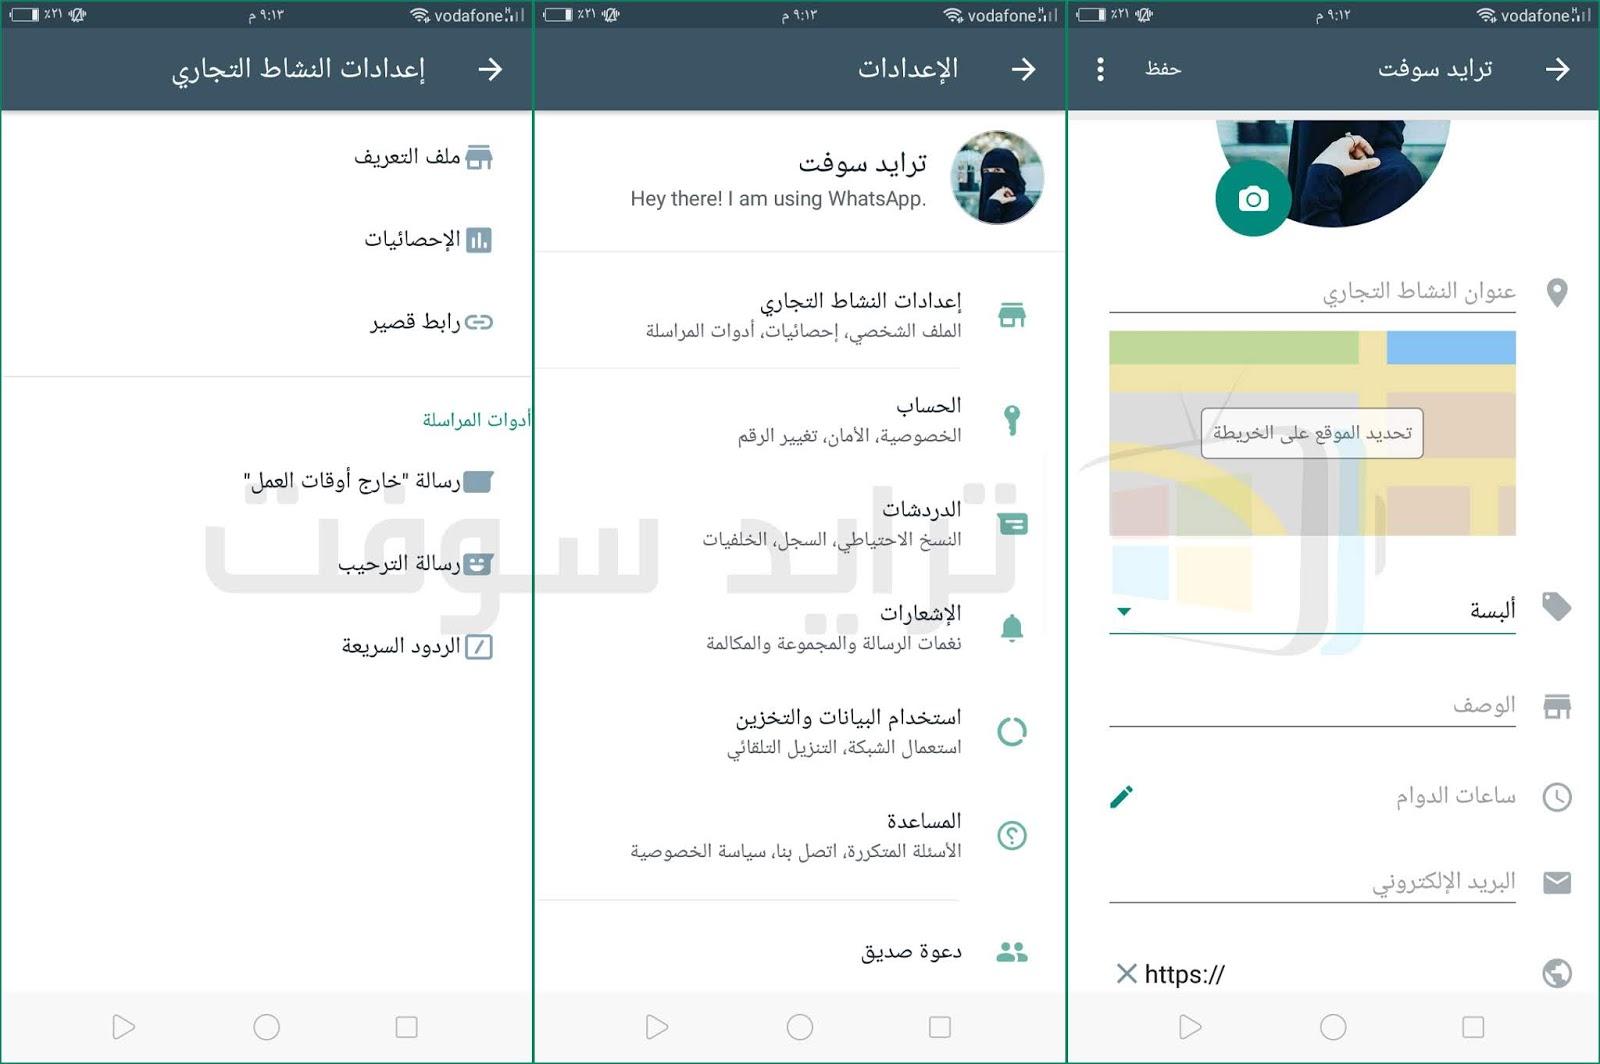 تحميل واتساب بيزنس WhatsApp Business 2 19 35 أخر إصدار